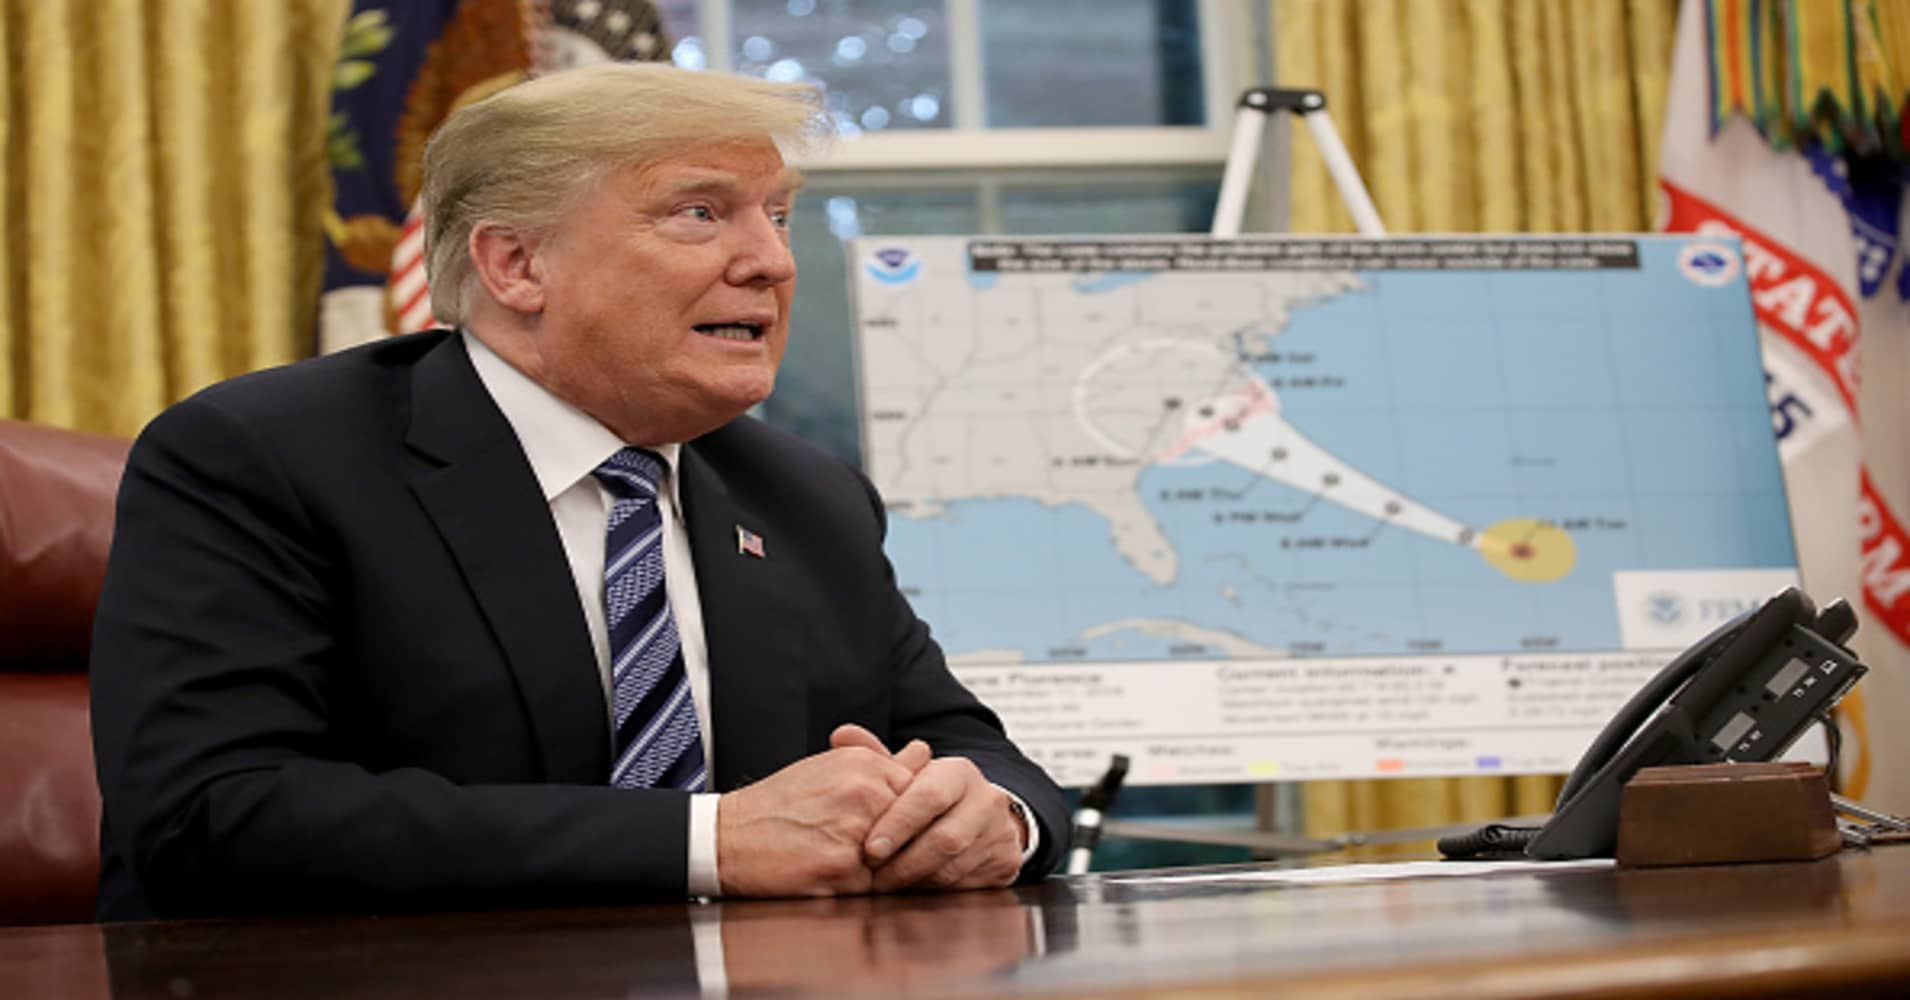 Trump: Puerto Rico response 'incredible unsung success'